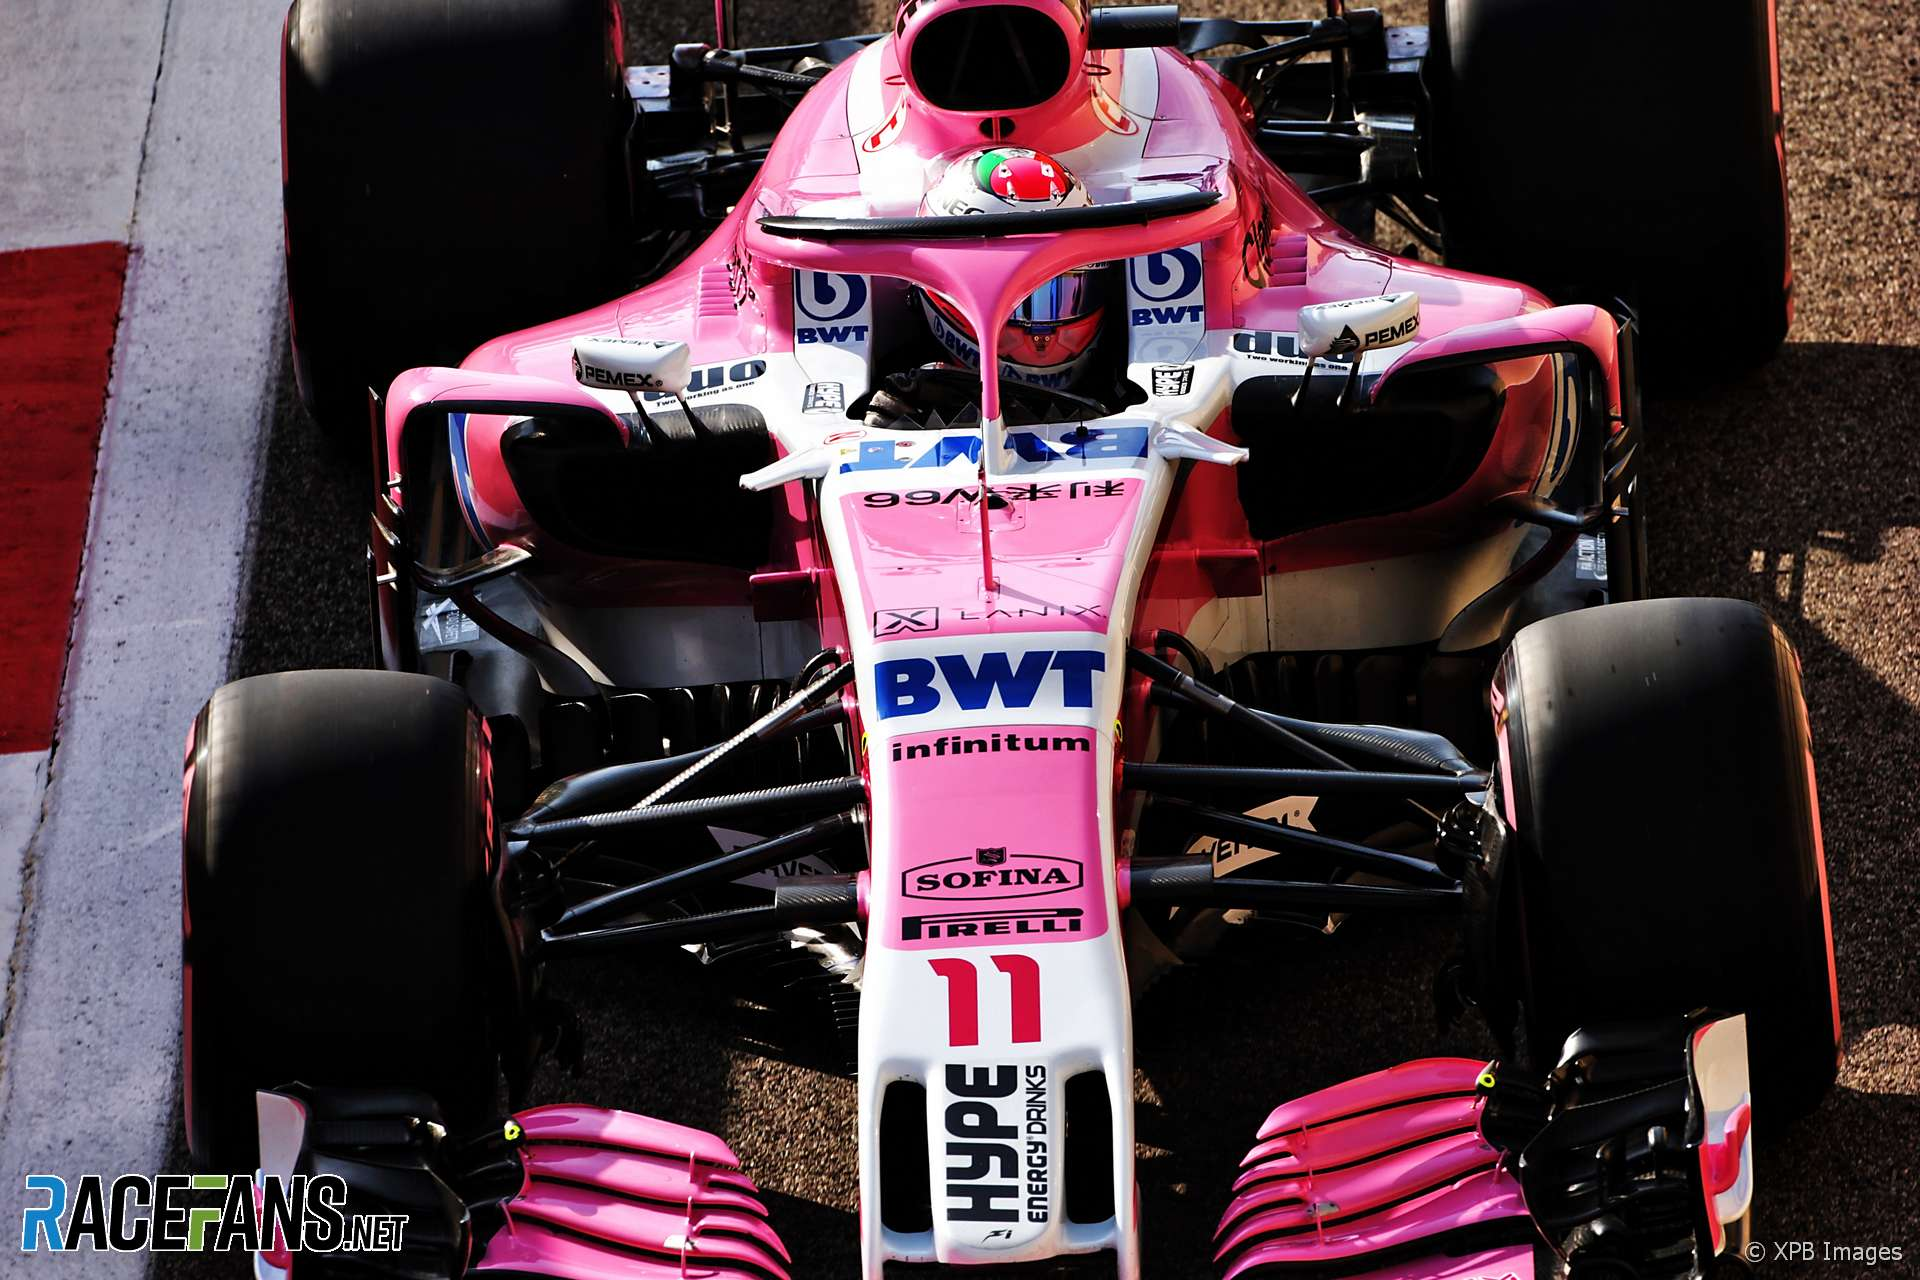 Sergio Perez, Force India, Interlagos, 2018